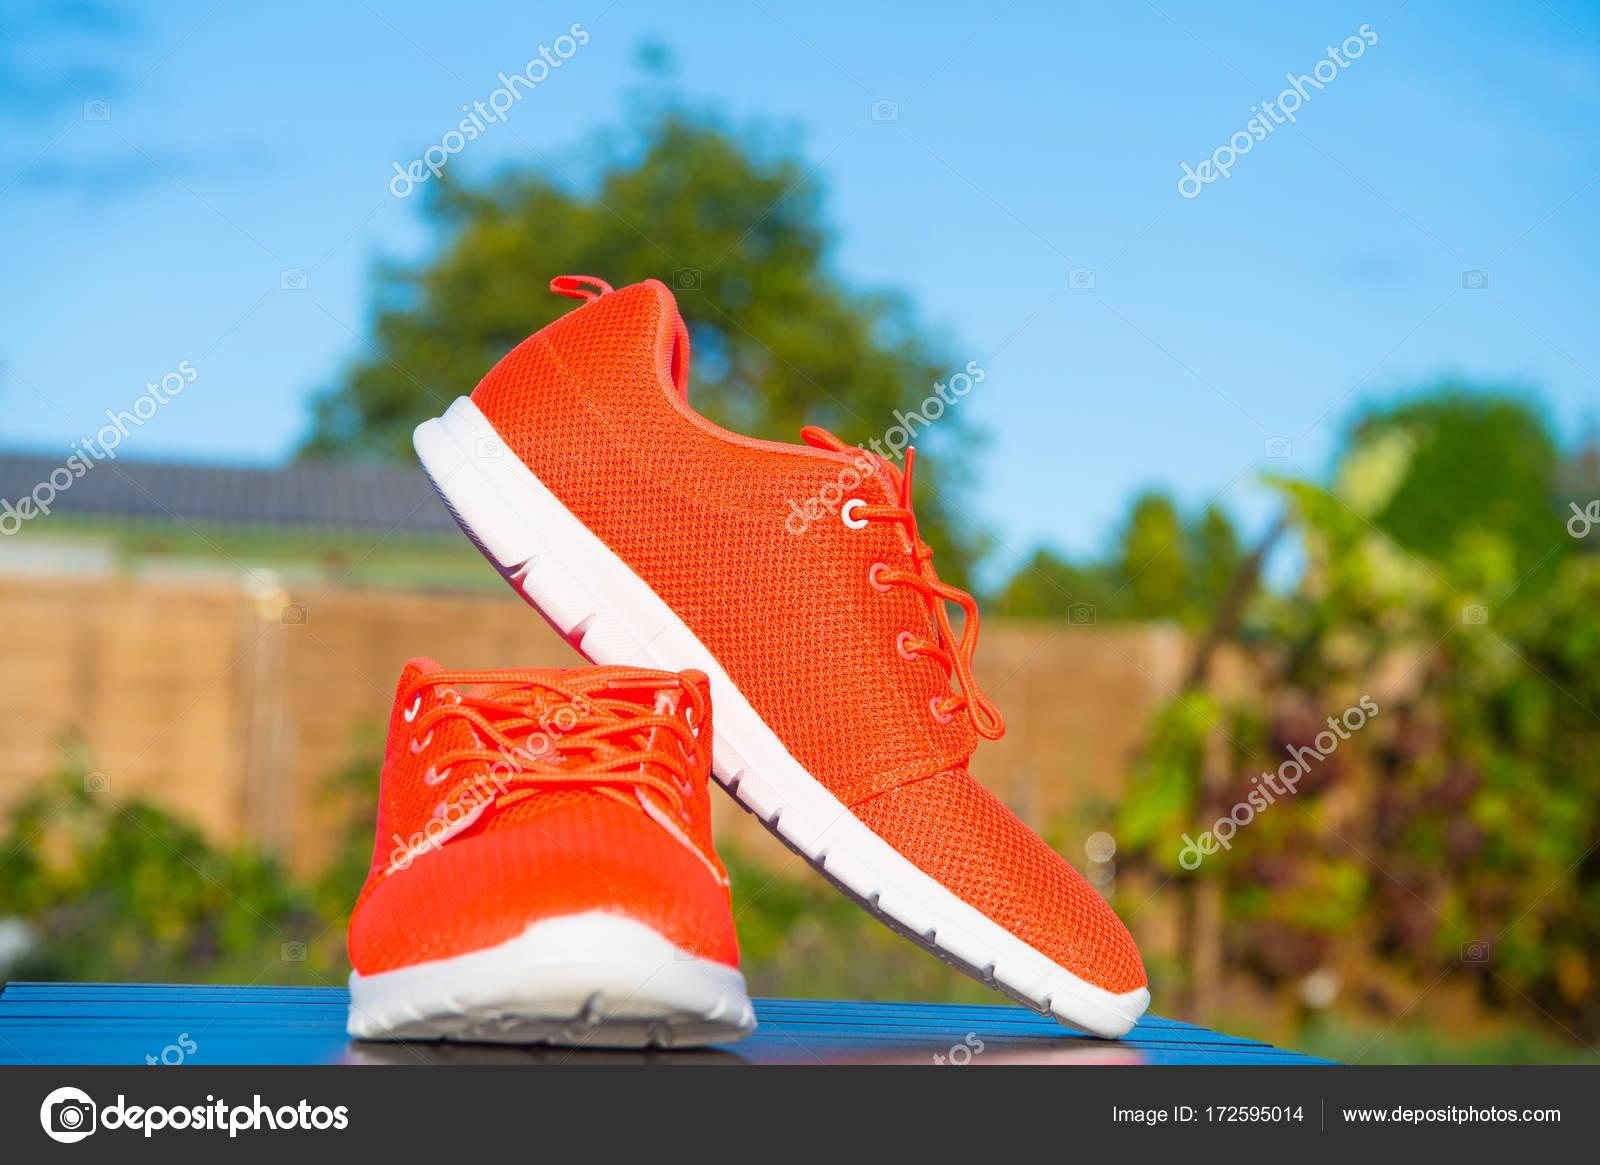 size 40 b5397 44afd depositphotos 172595014-stockafbeelding-sport-schoenen-sneakers-felle-oranje.jpg